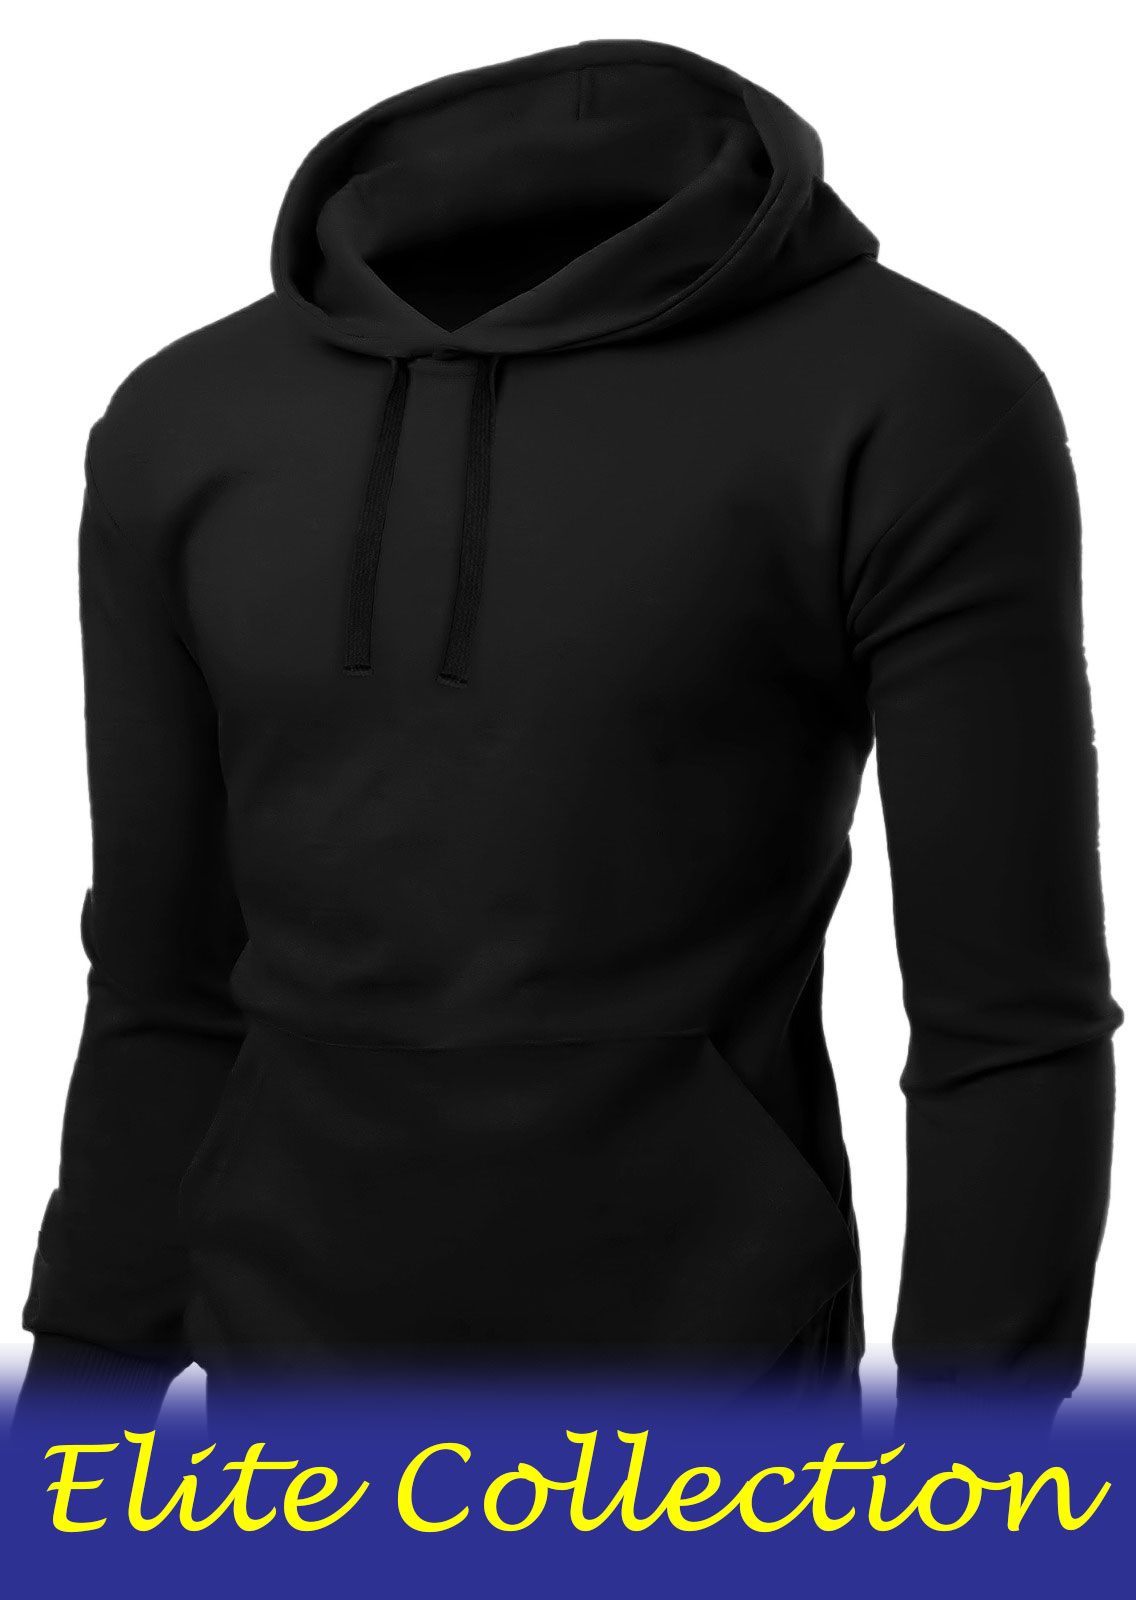 ACTIVE STAR Unisex Fleece Pullover Black Hoodie(Elite Collection)